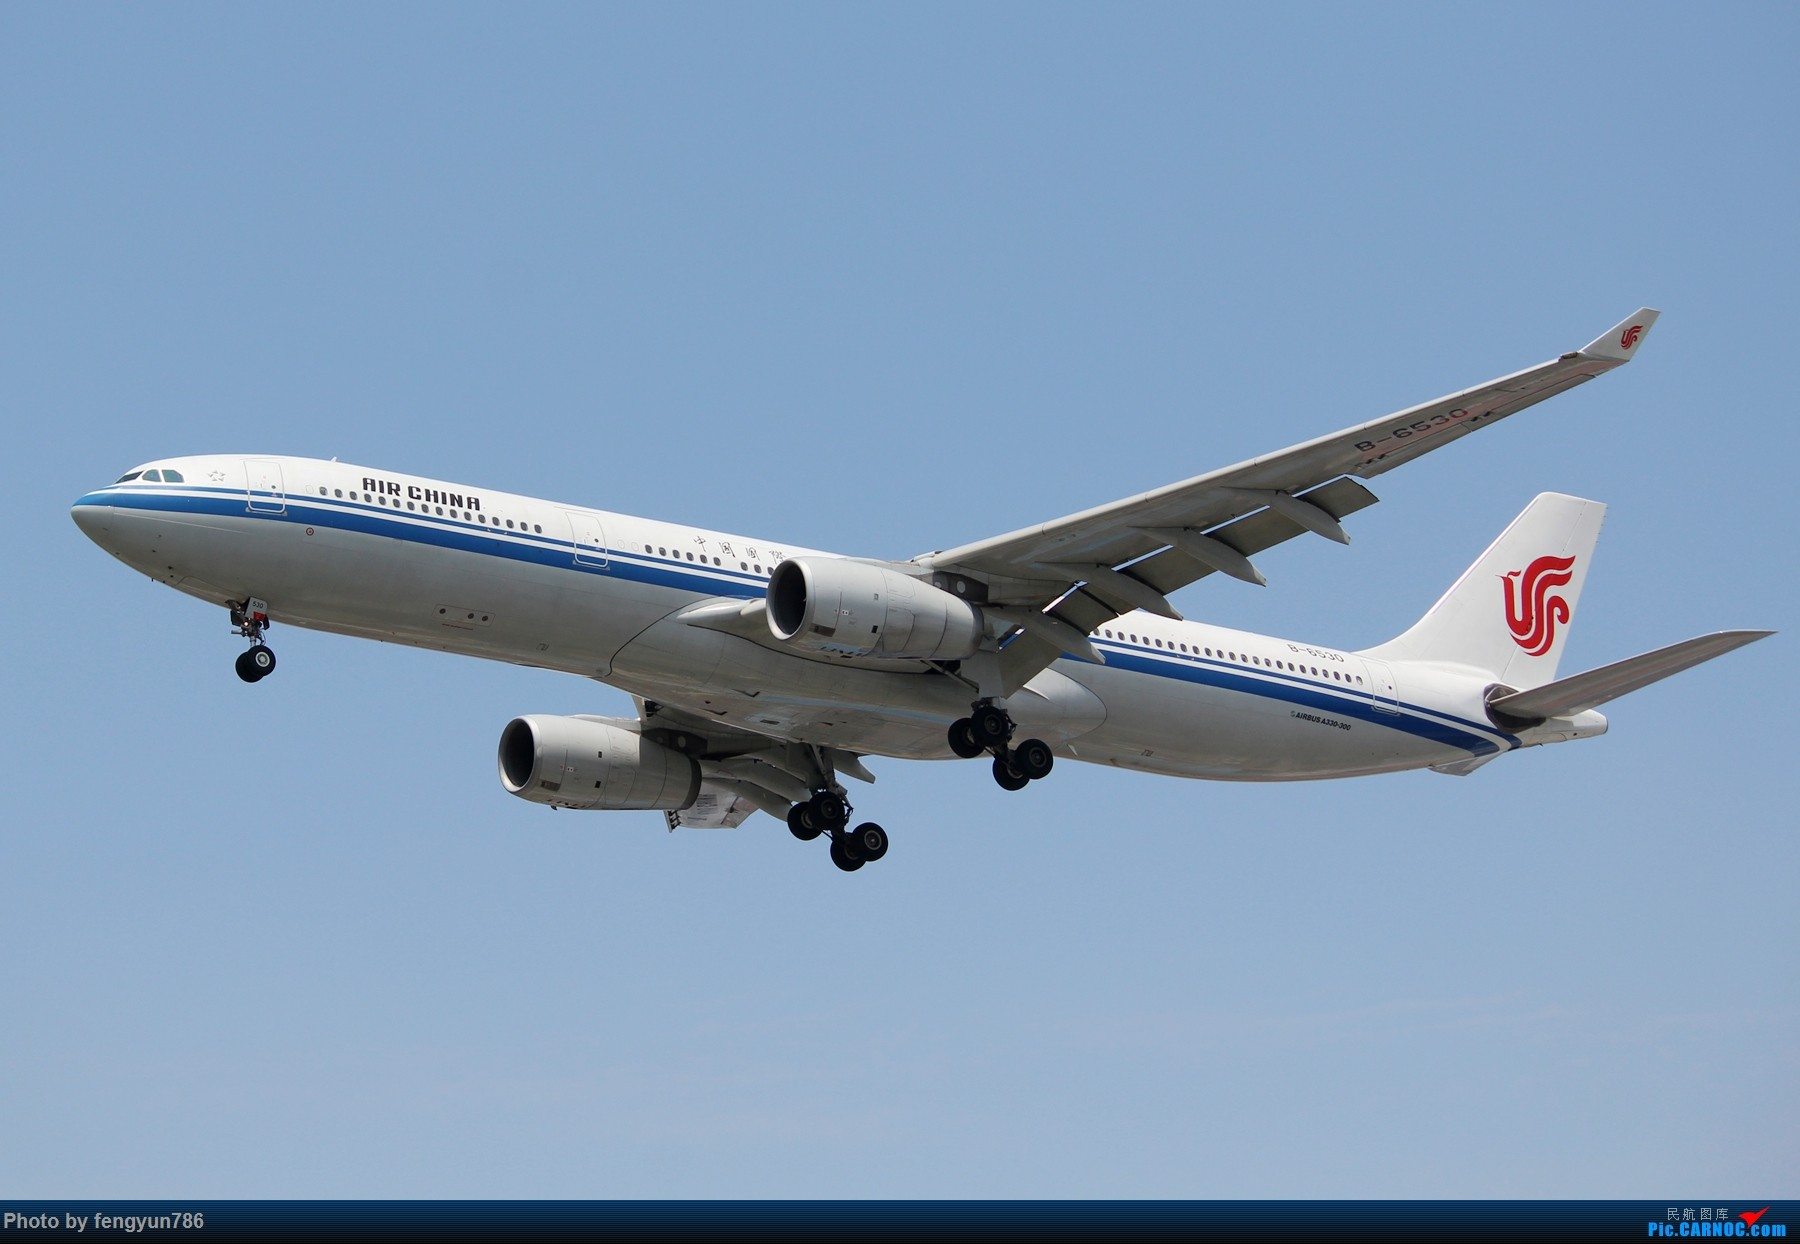 Re:[原创]7.19的SHA,天晴温高,发几个跟前一天不一样的。 AIRBUS A330-300 B-6530 中国上海虹桥国际机场